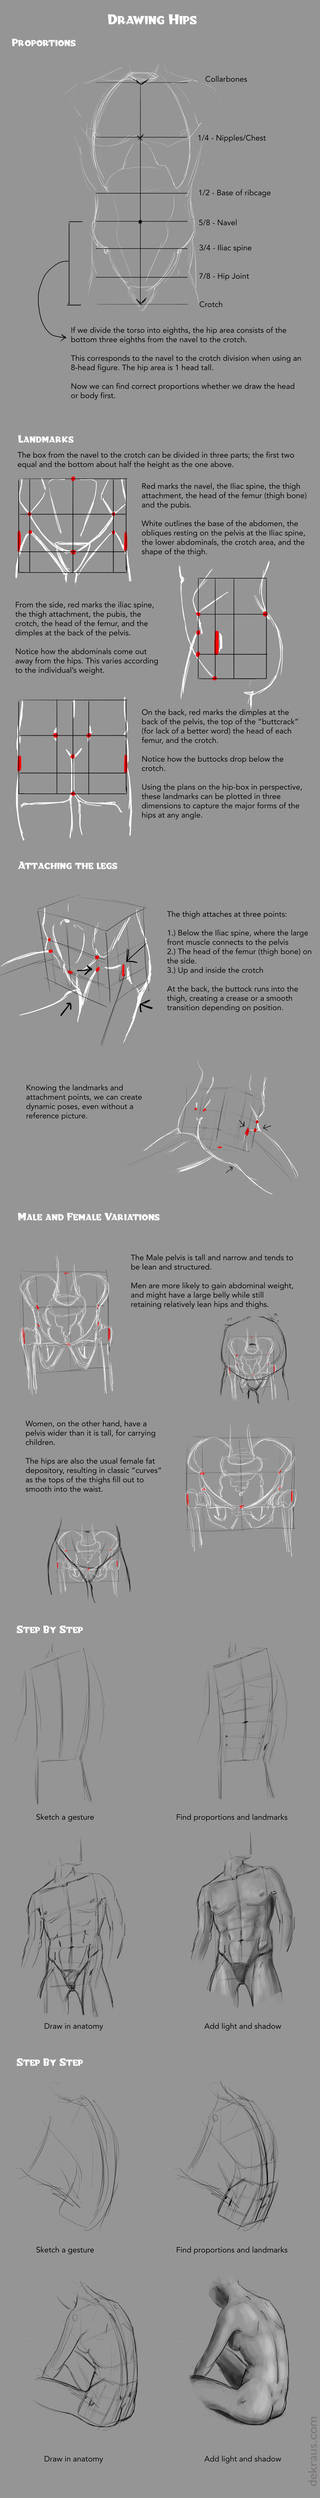 Drawing Hips Tutorial